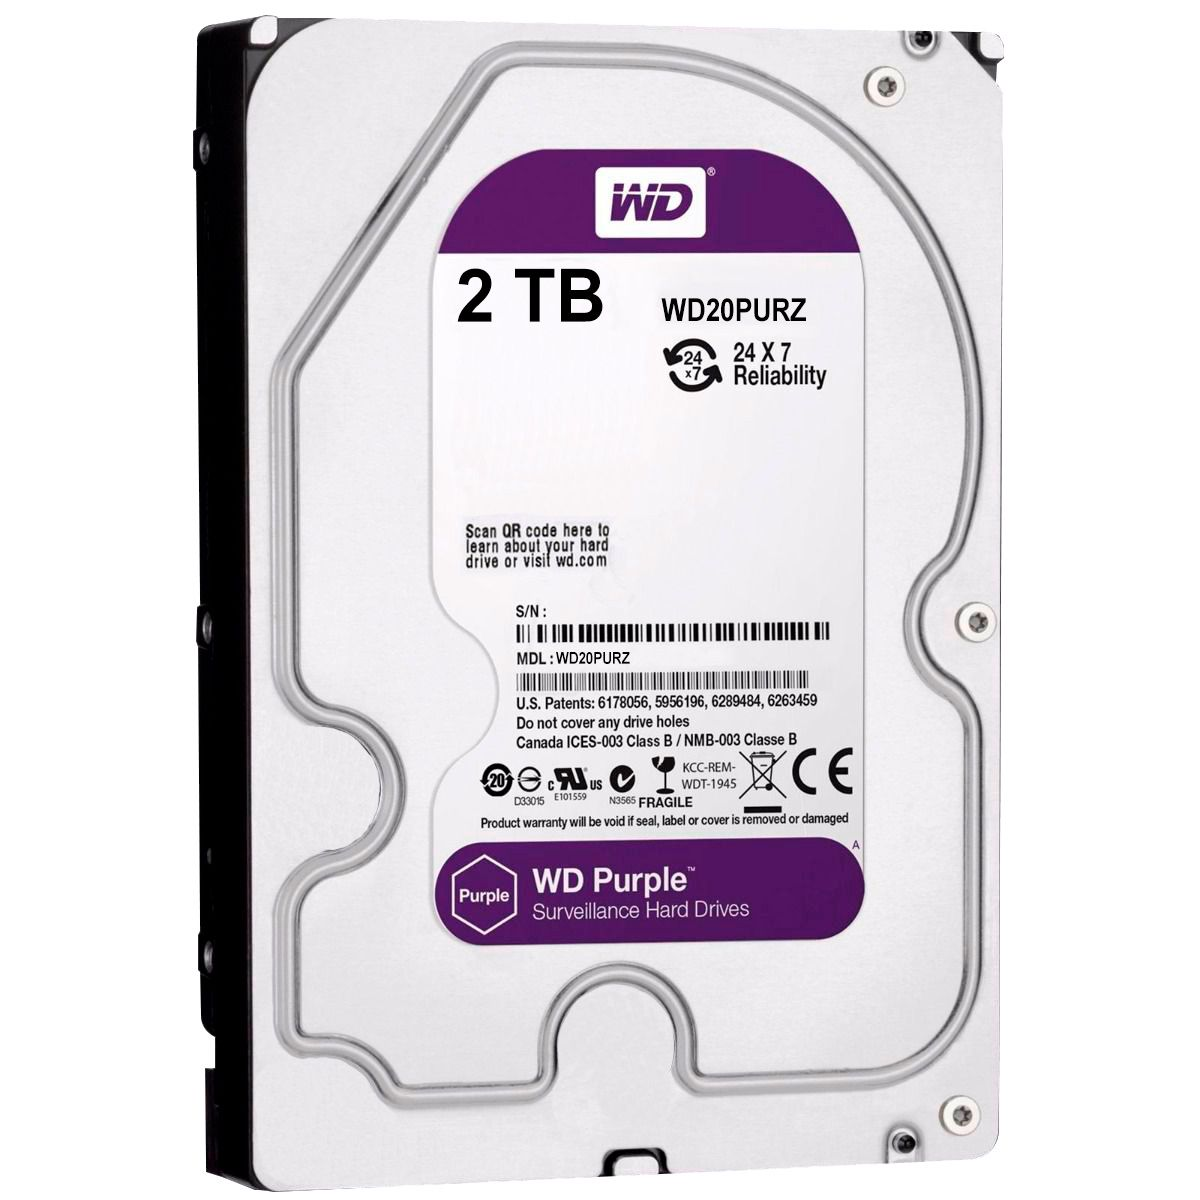 Kit 16 Câmeras de Segurança Full HD 1080p VHD 3230B G4 + DVR Intelbras Full HD + HD WD Purple 2TB + Acessórios  - Tudo Forte